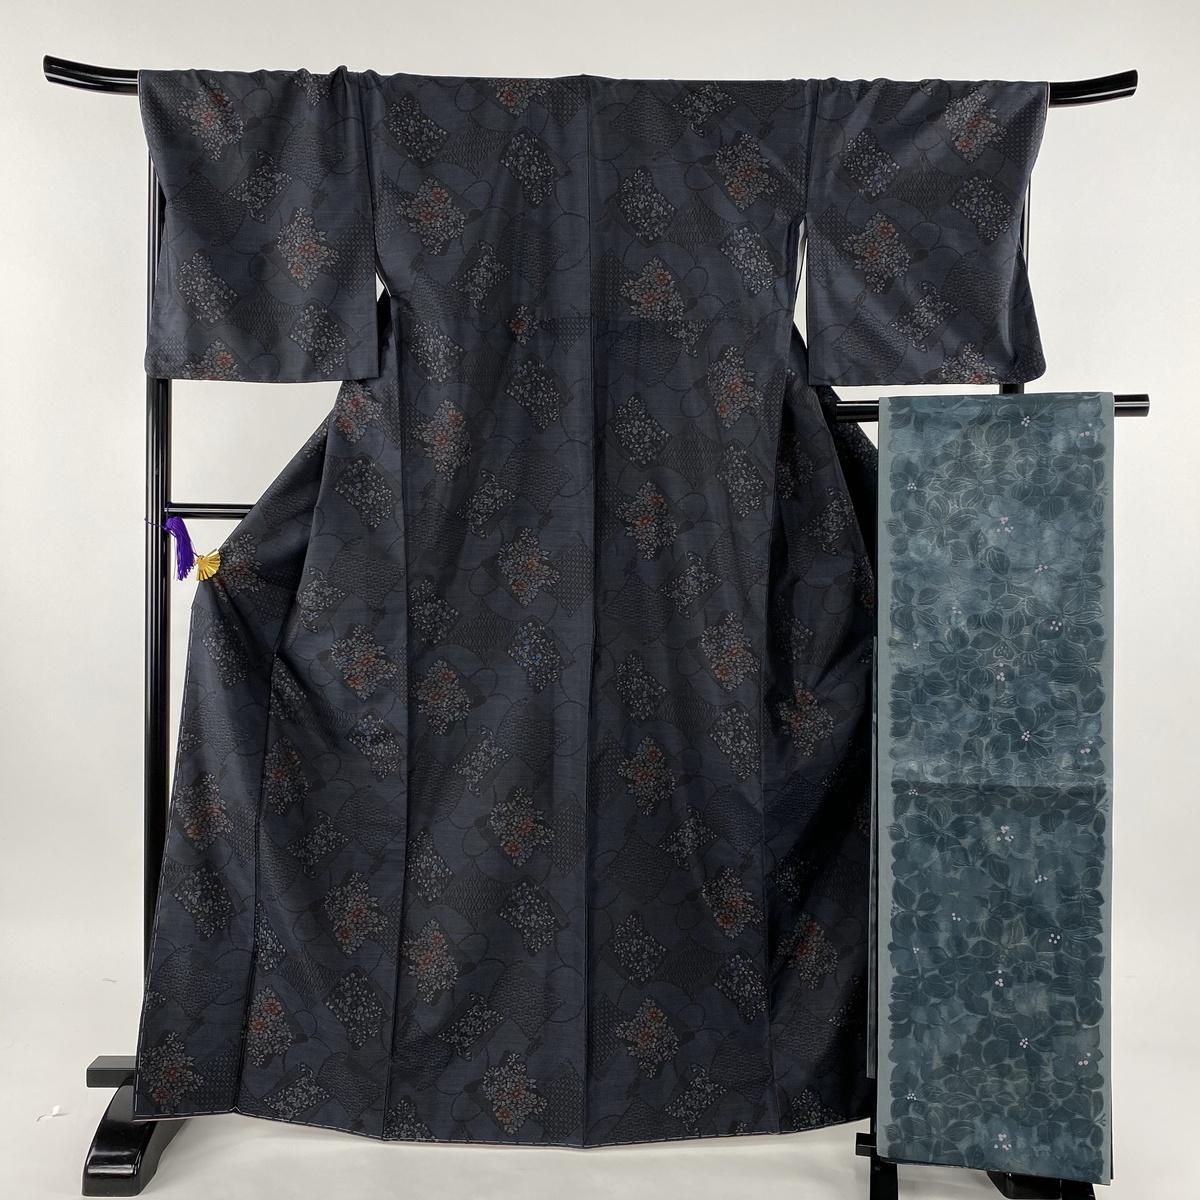 大島紬 美品 秀品 証紙あり 袋帯セット 草花 有職文様 藍色 袷 身丈168cm 裄丈70.5cm L 正絹 【中古】